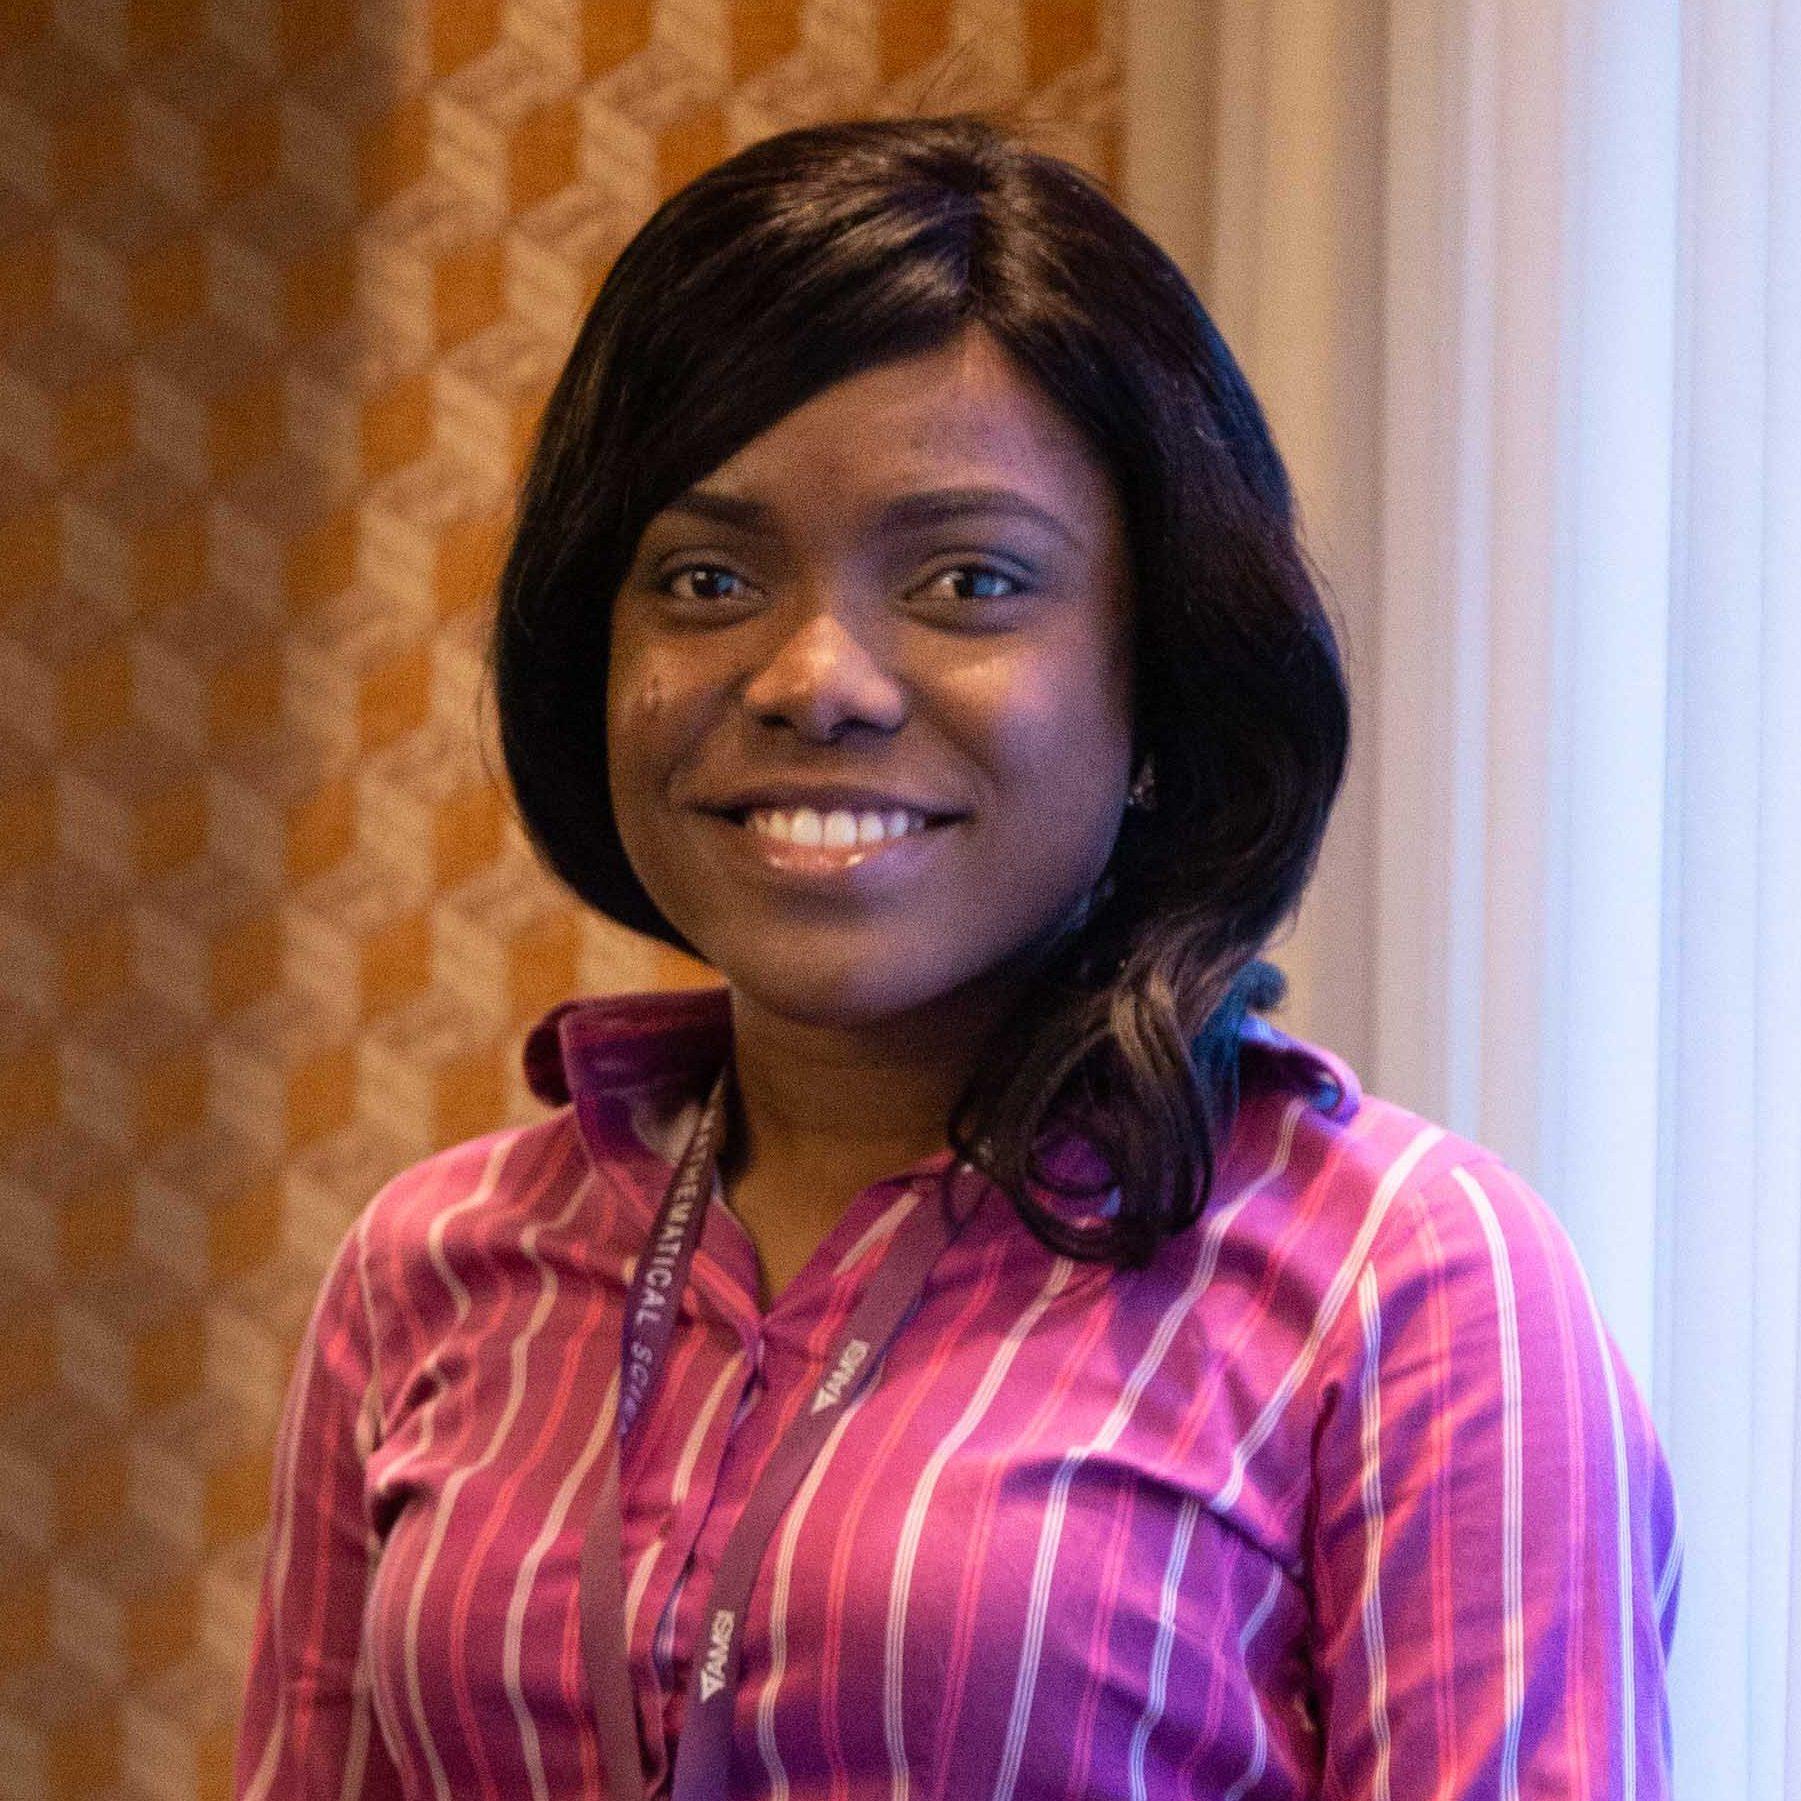 CHOOSEMATHS Grant recipient profile: Olanike Adeoye